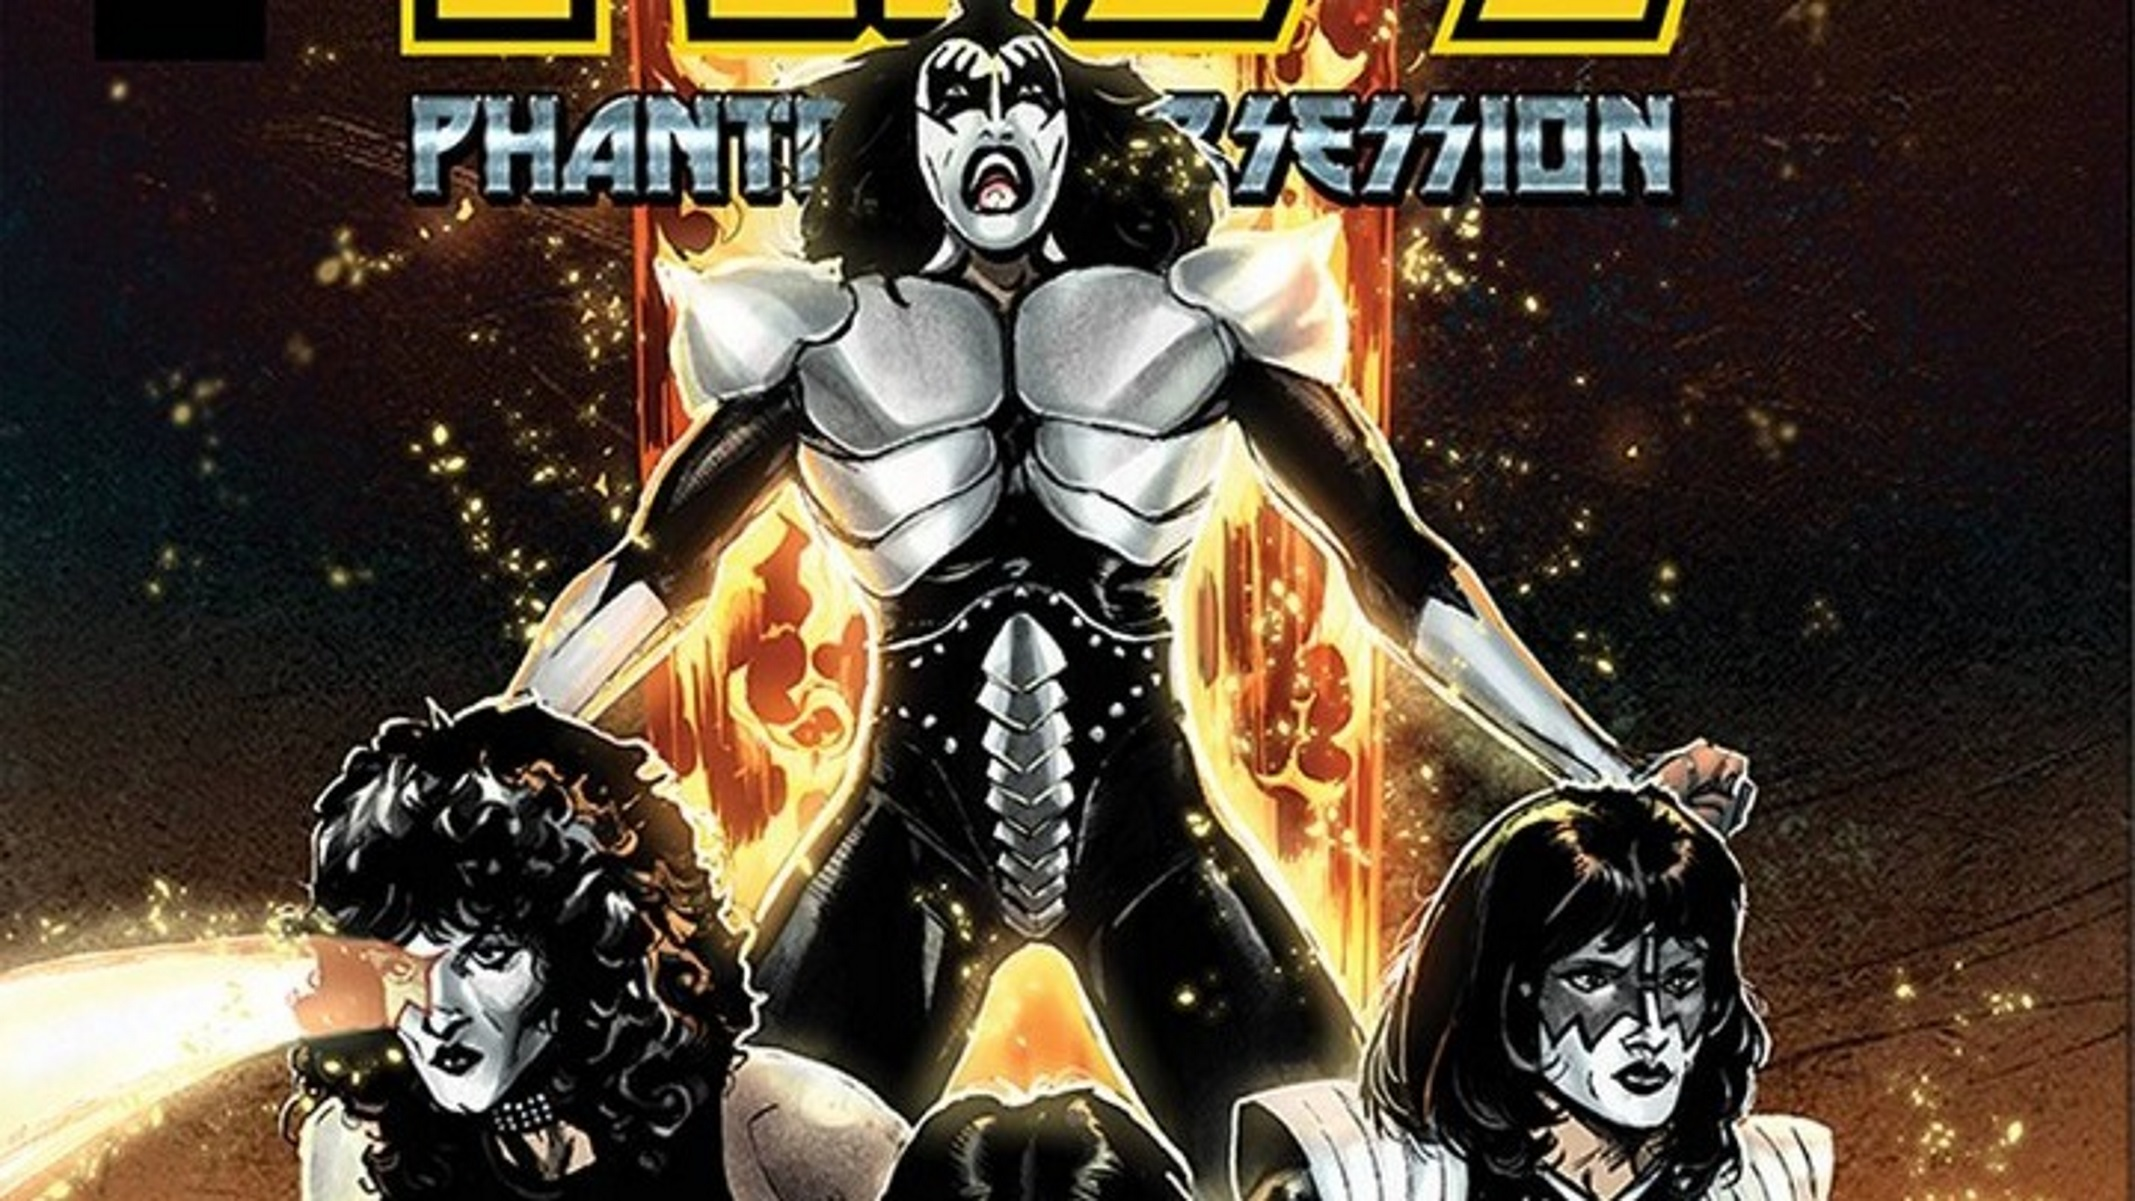 Kiss: Γιορτάζουν τα 50 τους χρόνια – Νέο κόμικ «Phantom Obsession» (video)